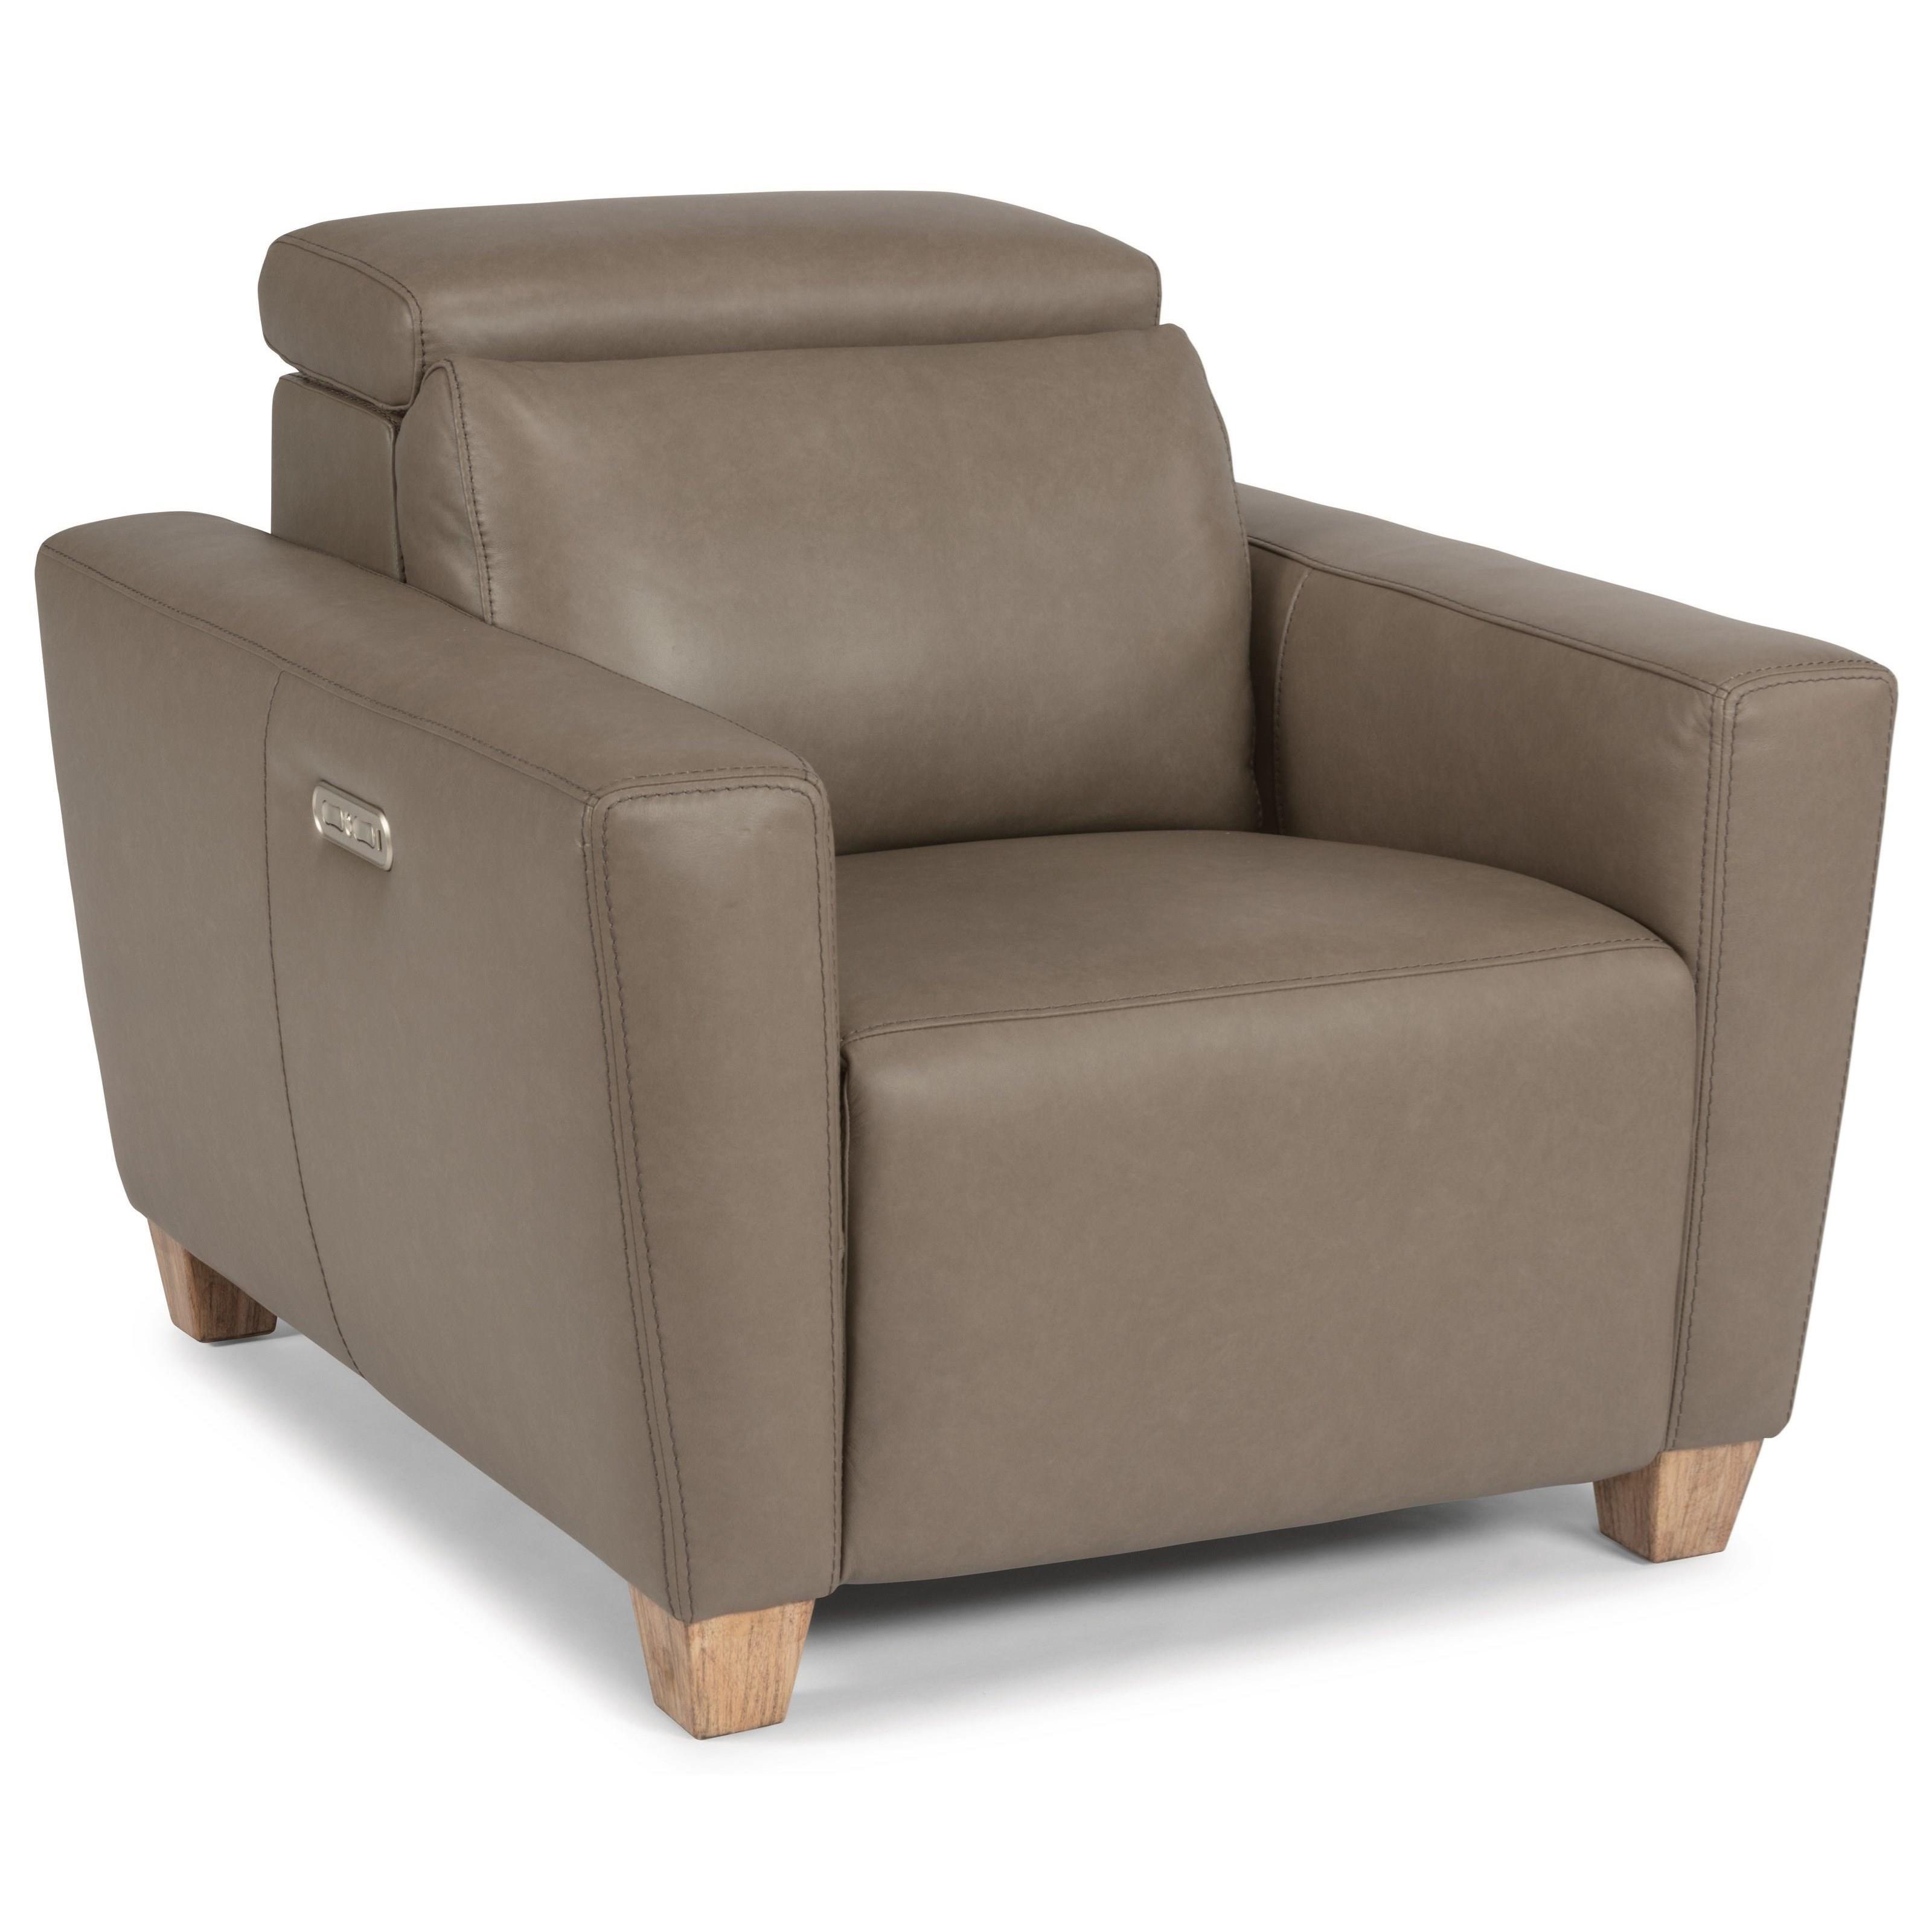 Latitudes - Astra Power Recliner w/ Pwr Headrest by Flexsteel at Walker's Furniture